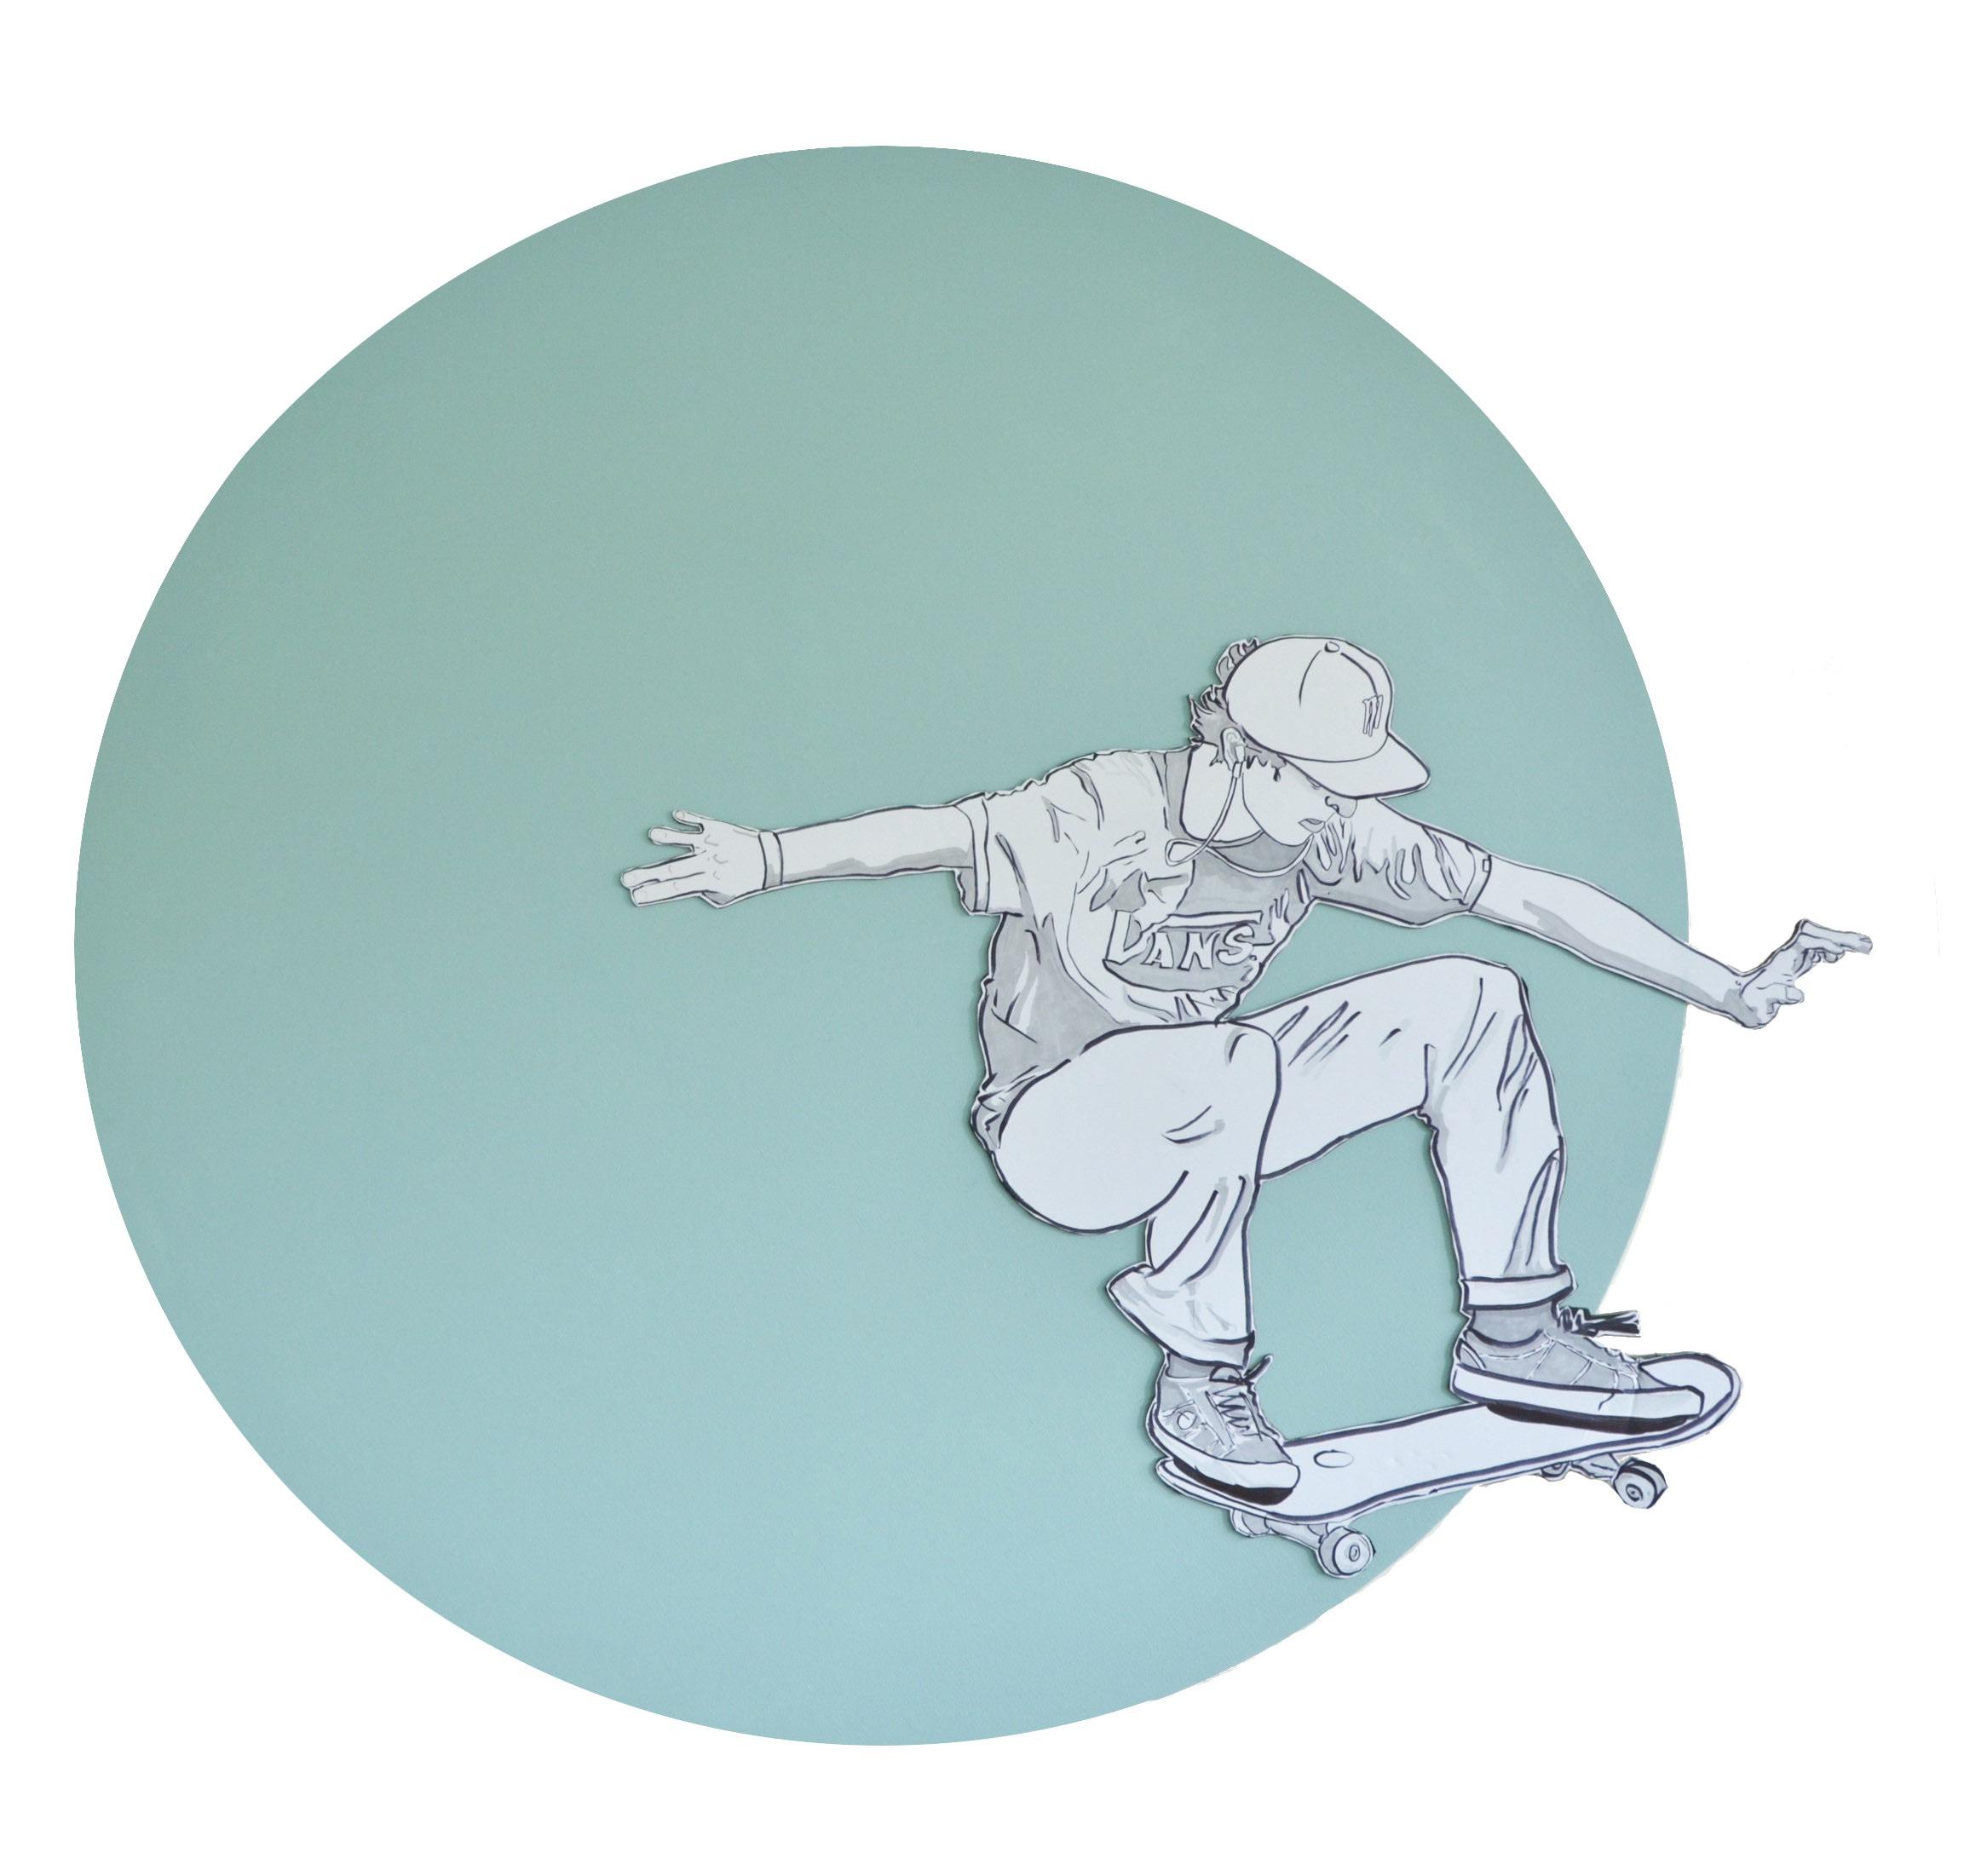 Skate, 2020